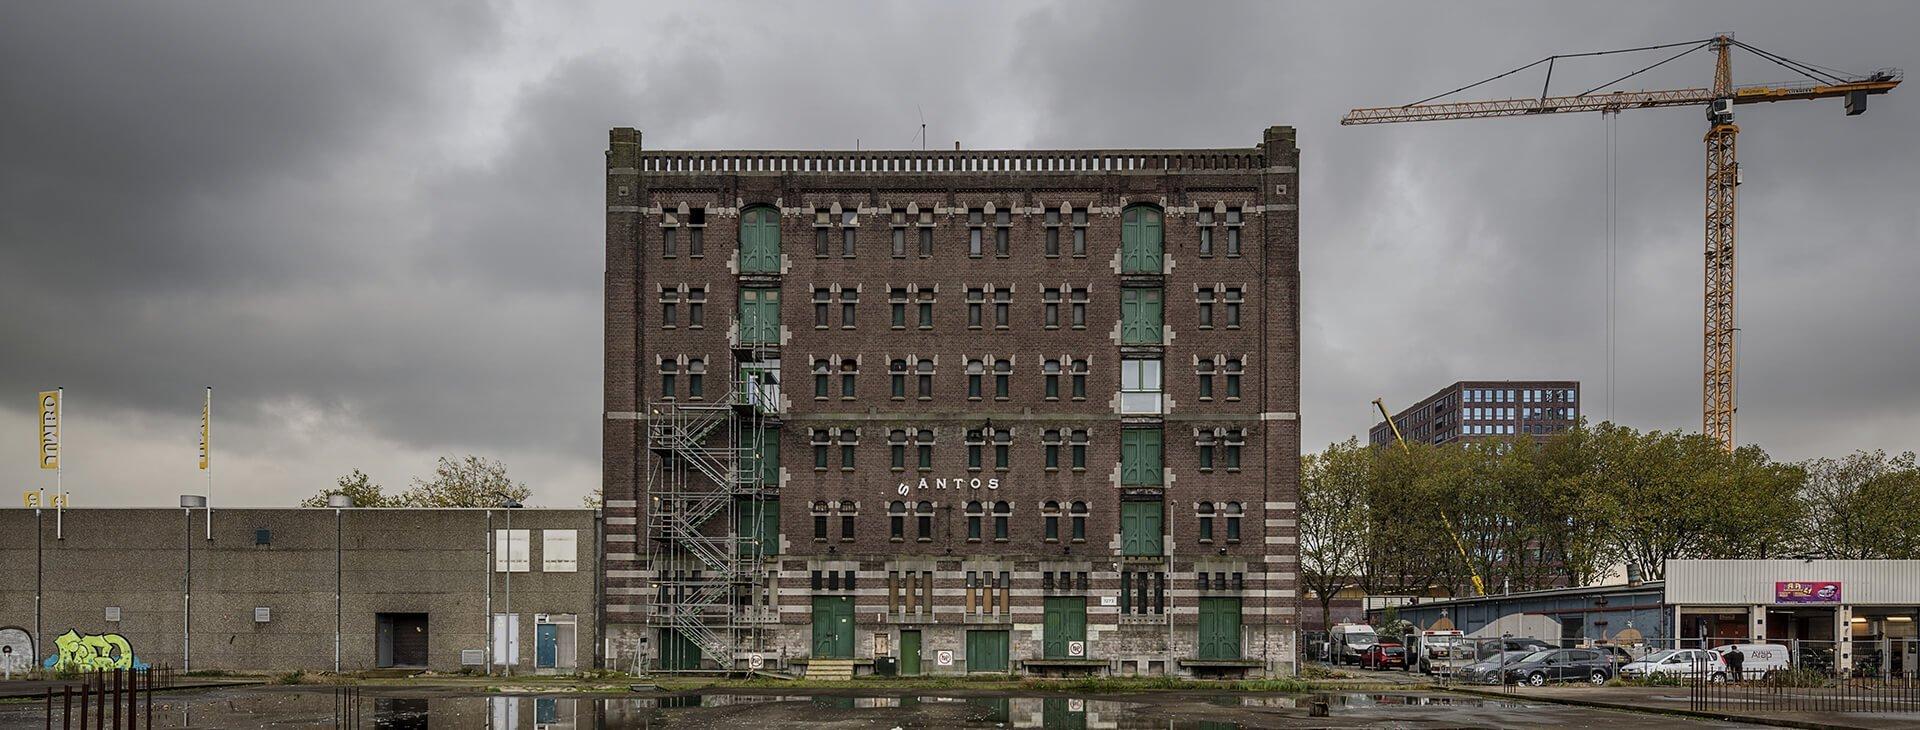 stilwerk_reclaimed_architecture_hospitality_santos_rotterdam_stage1